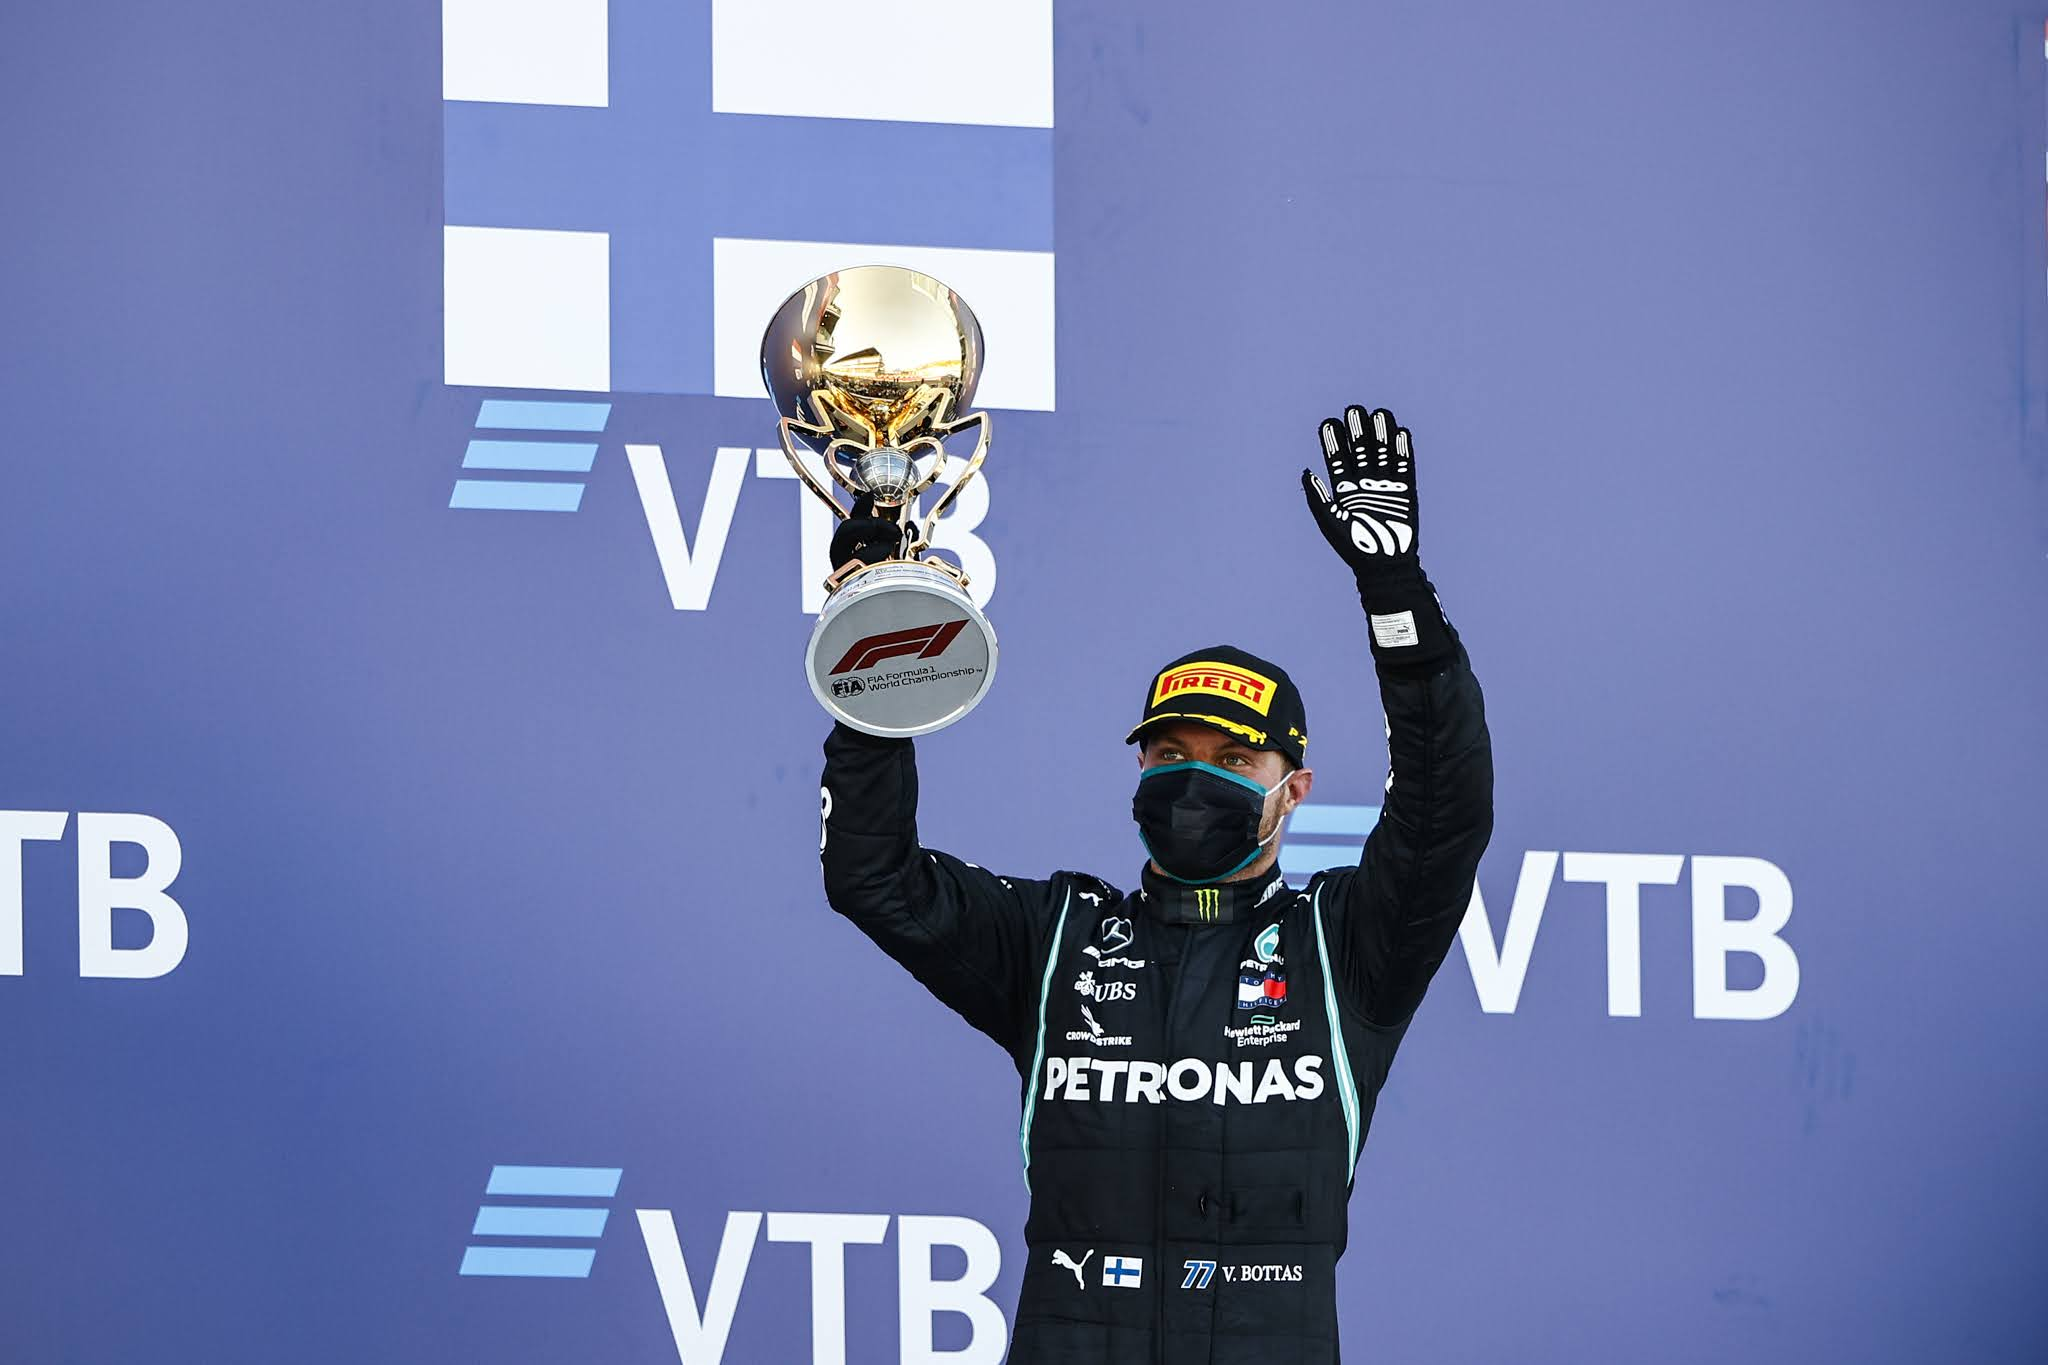 2020 Rusya Grand Prix!ini Bottas kazandı